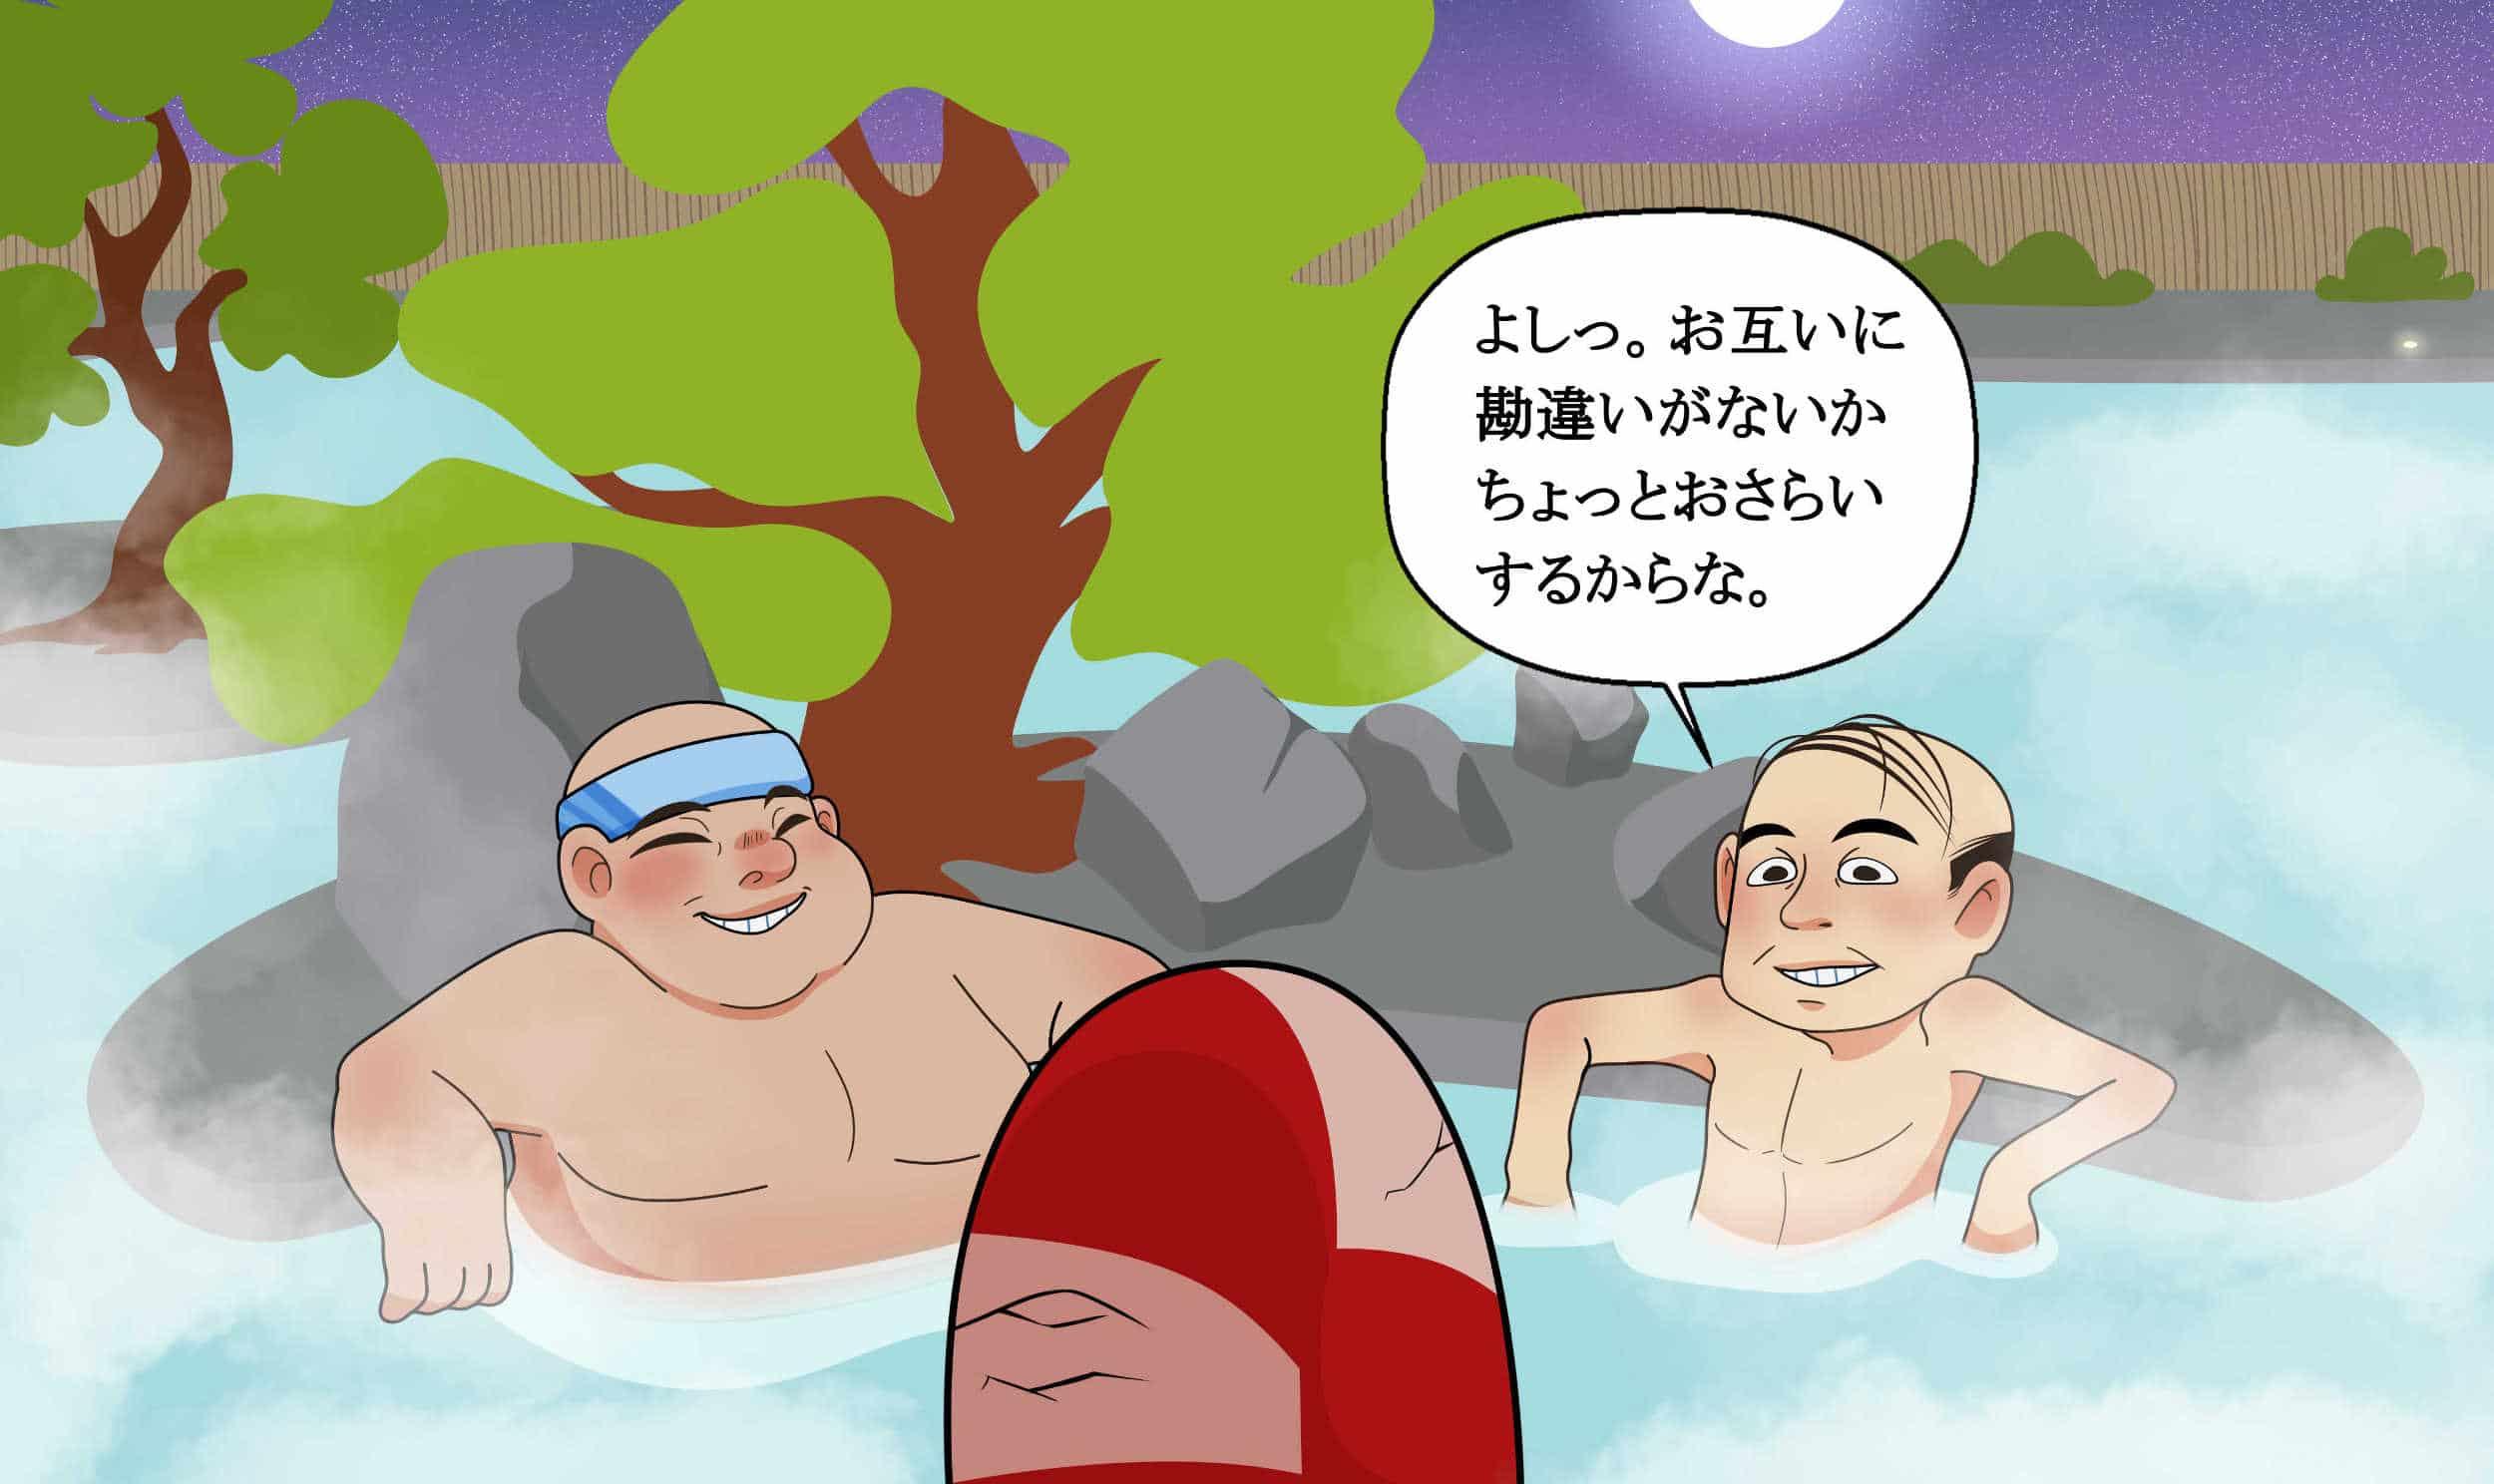 Onsen_31 (repeat)-min.jpg